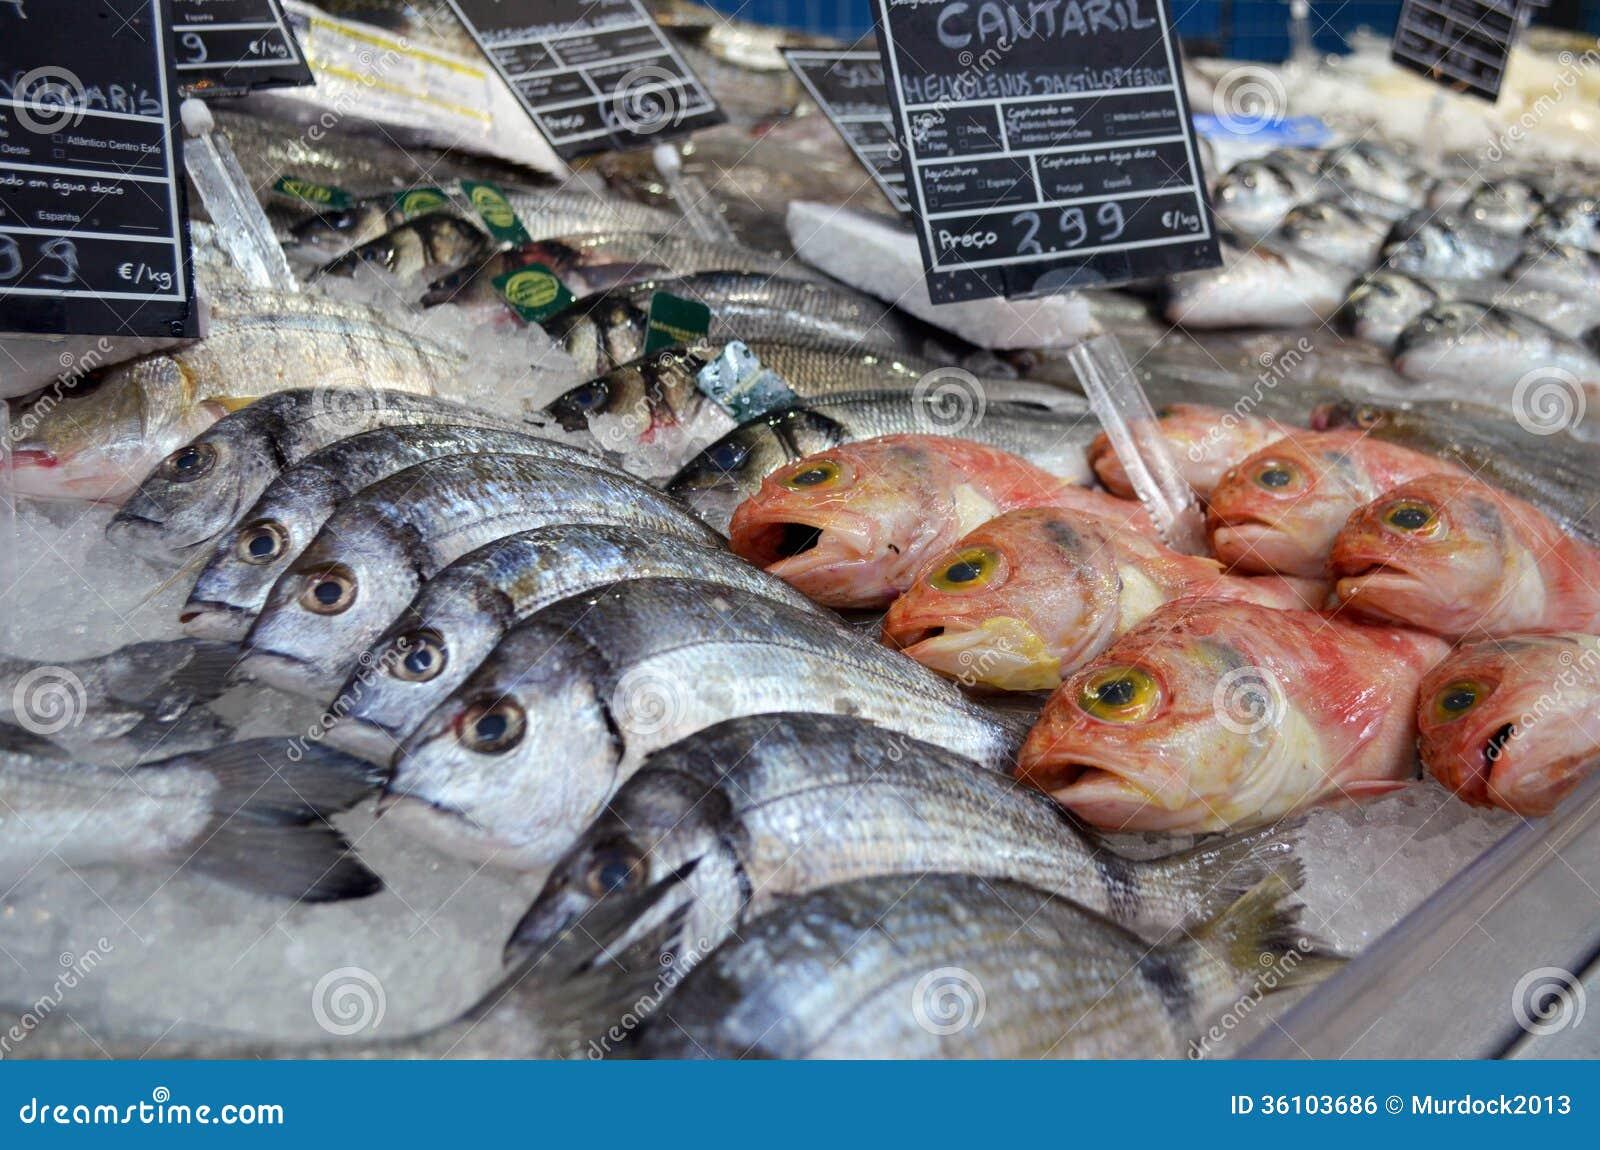 Fish market stock photo. Image of stall, sell, market - 36103686